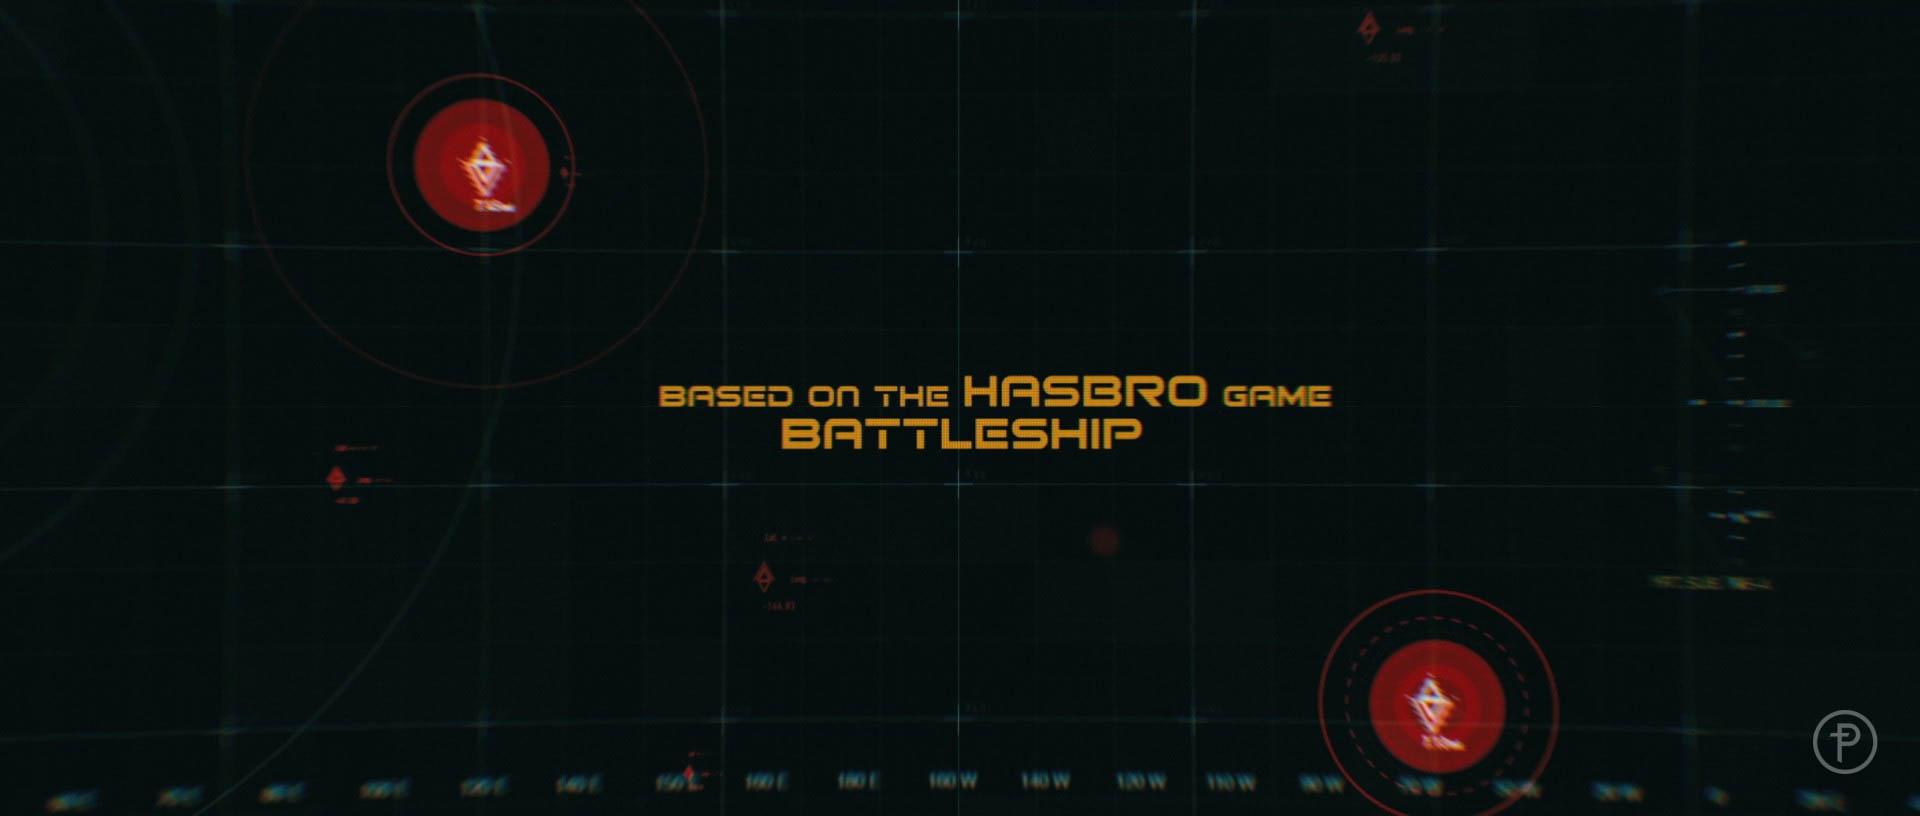 Zai_Ortiz_battleship_-6.jpg